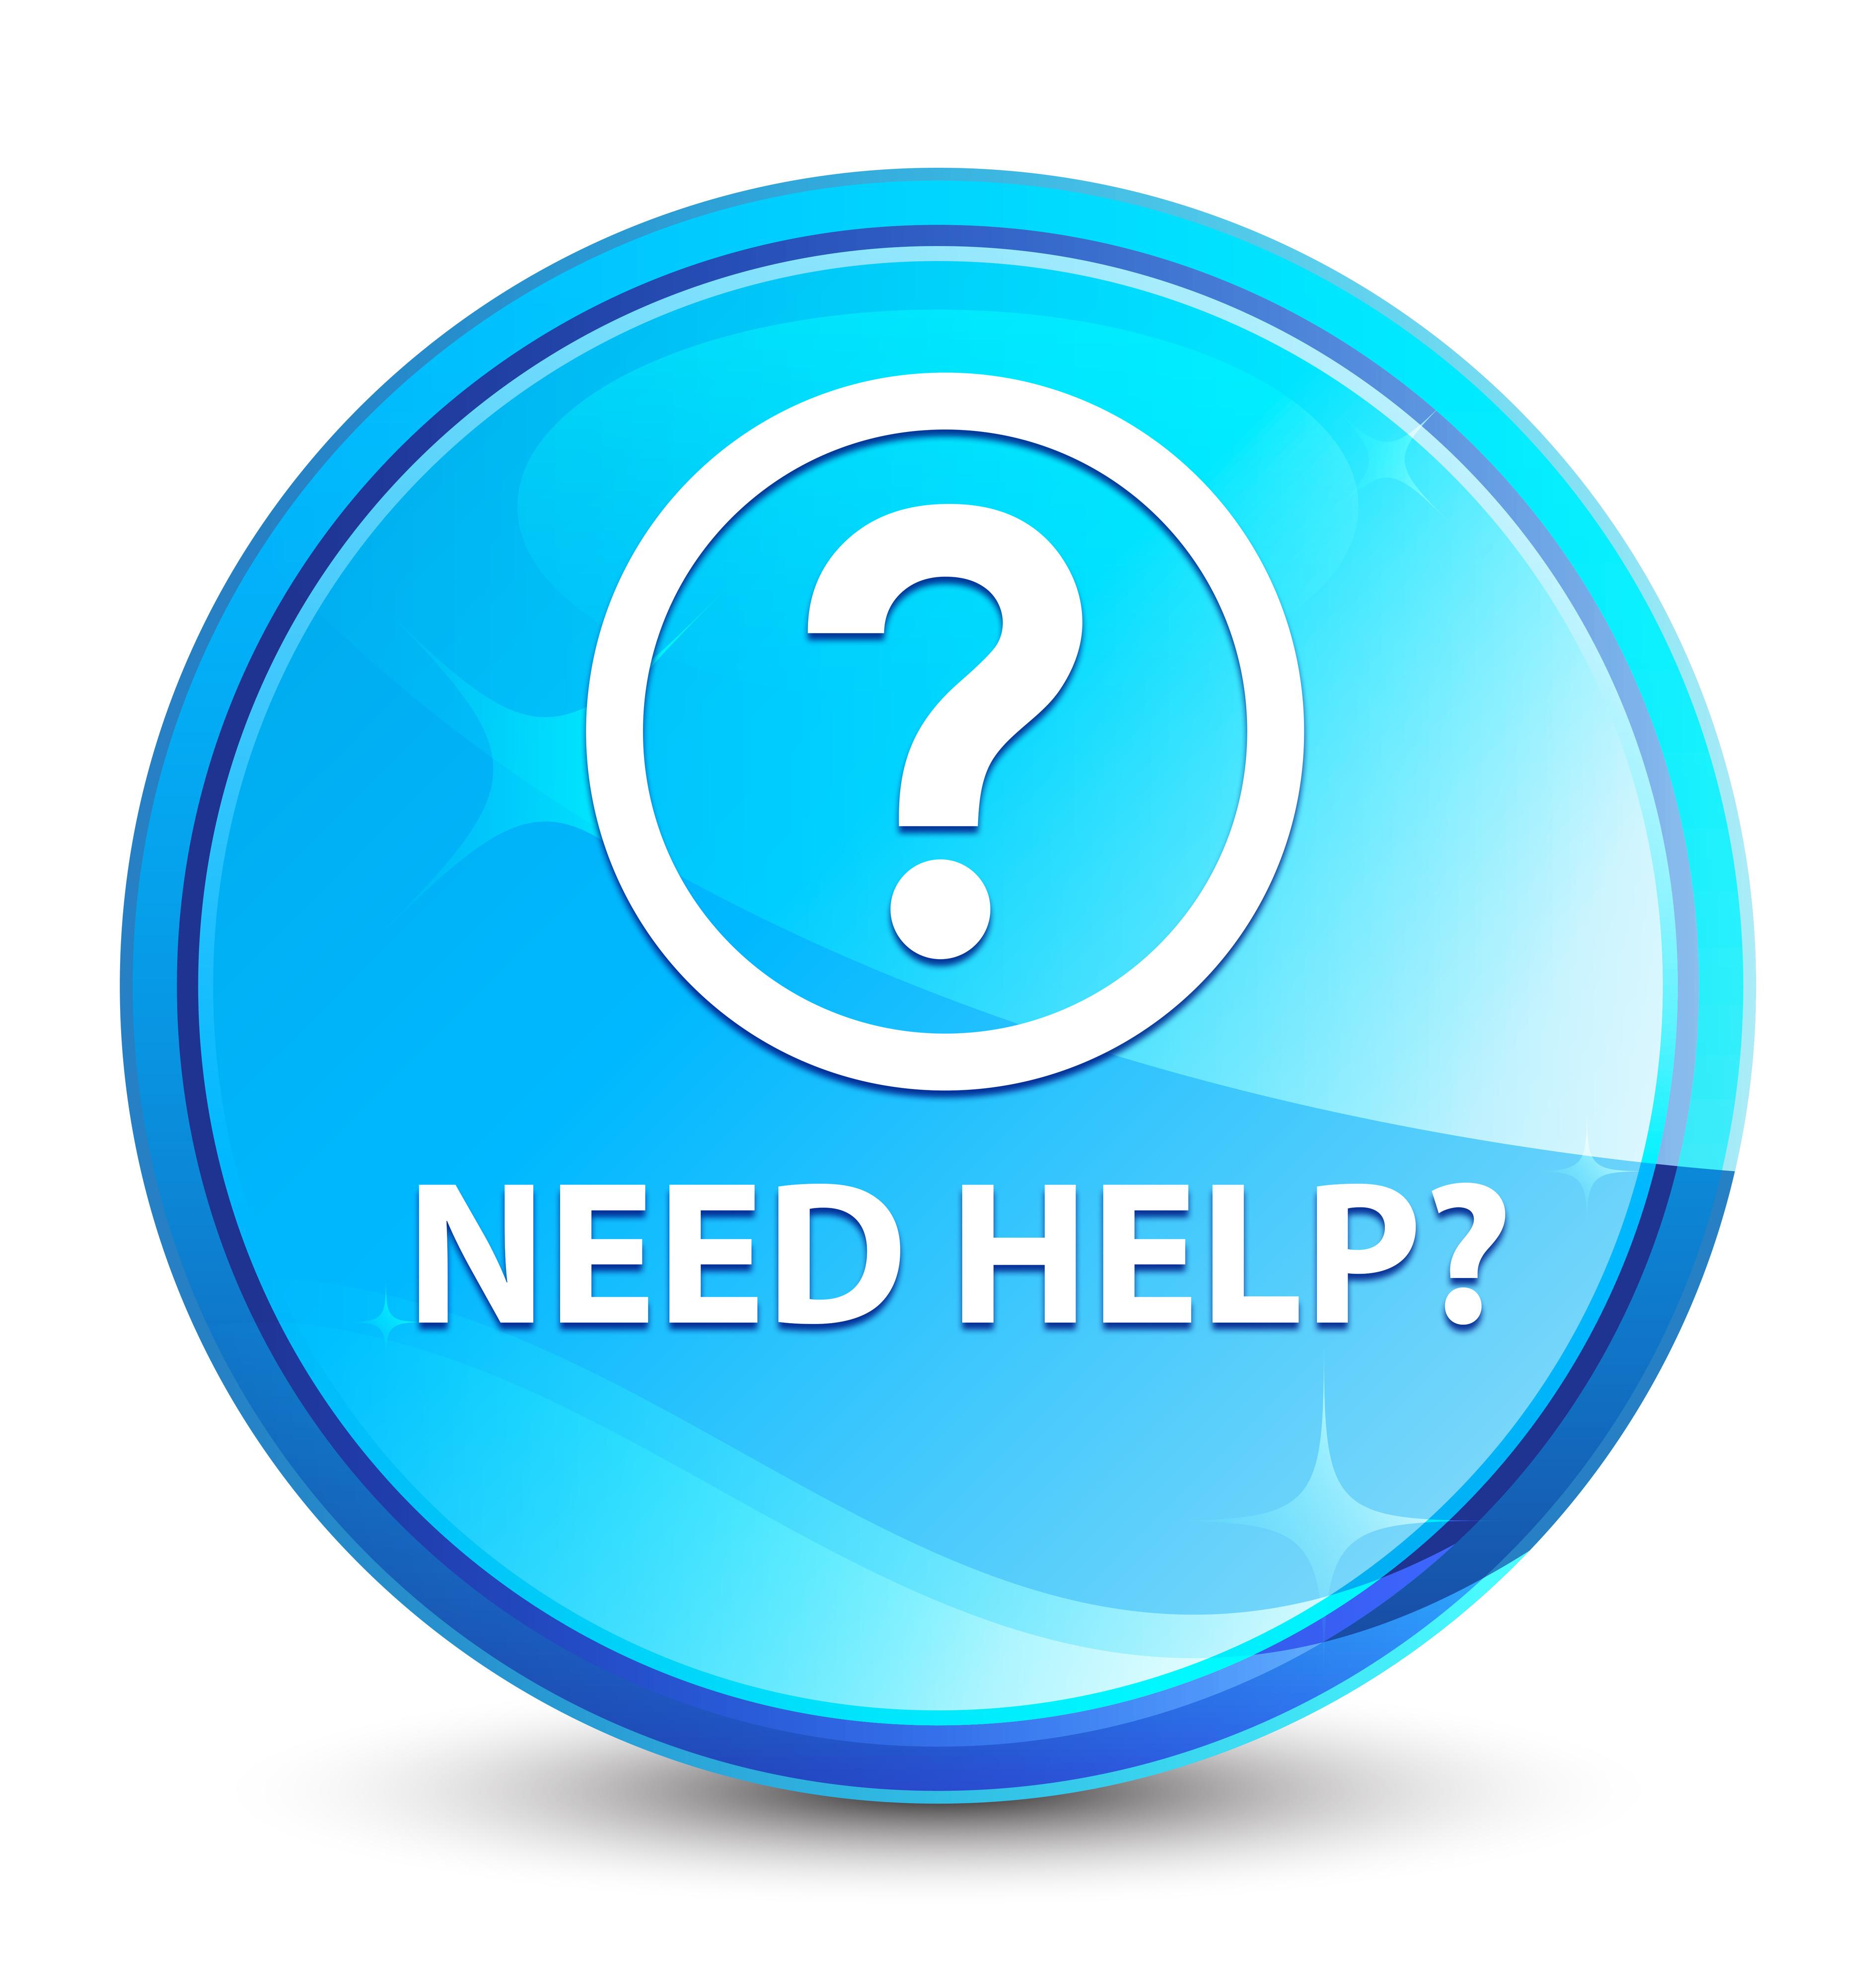 Need Help (question Icon) Splash Natural Blue Round Button